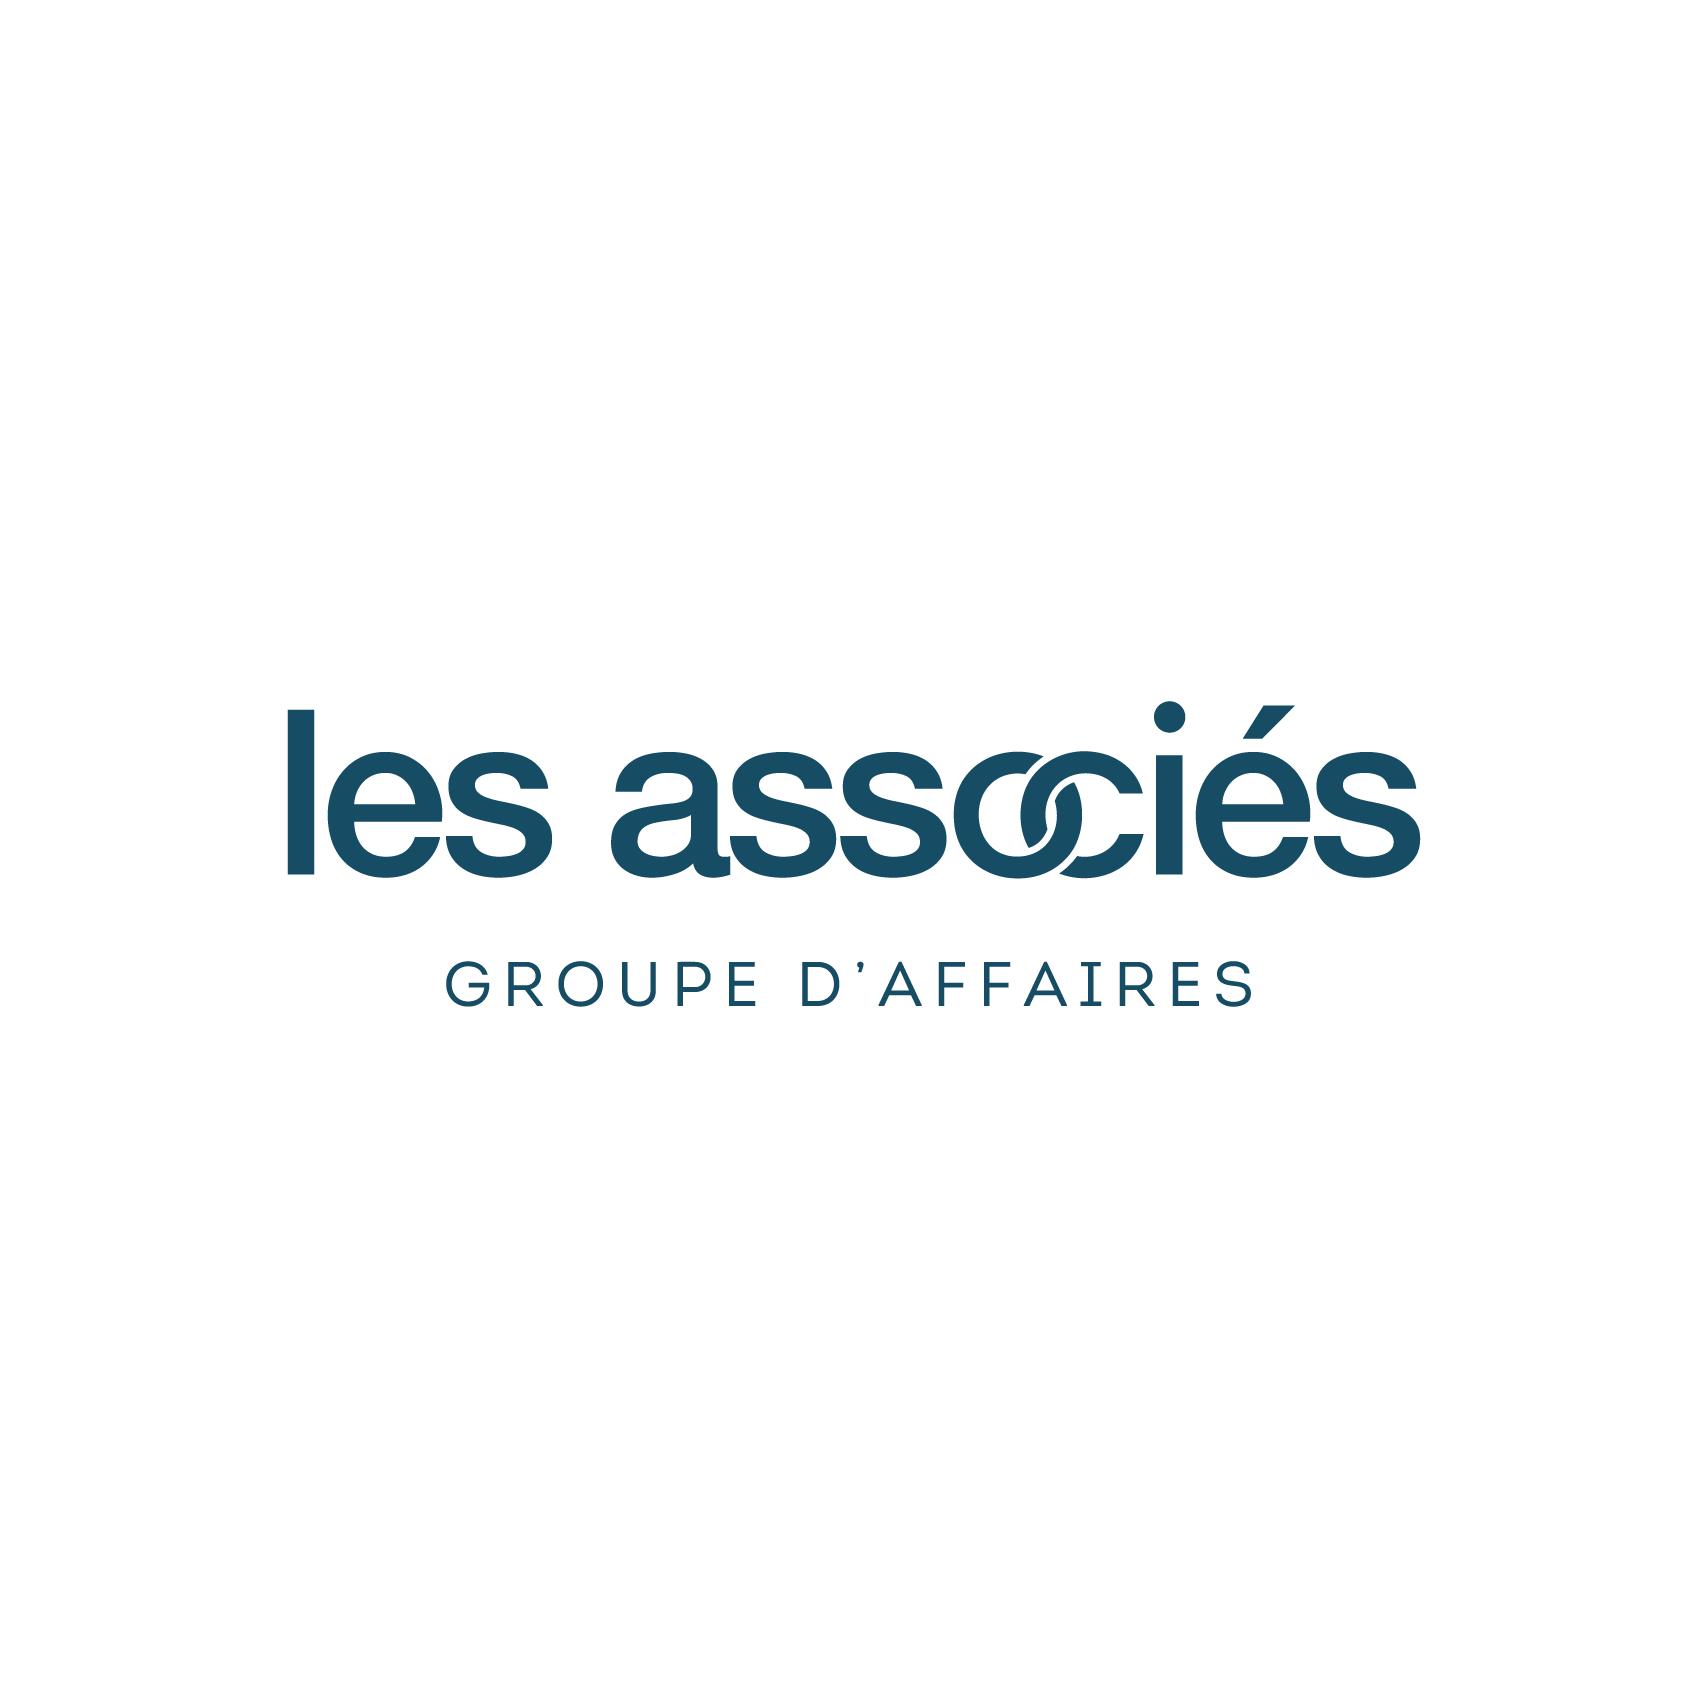 MlleRouge_logos_LesAssocies